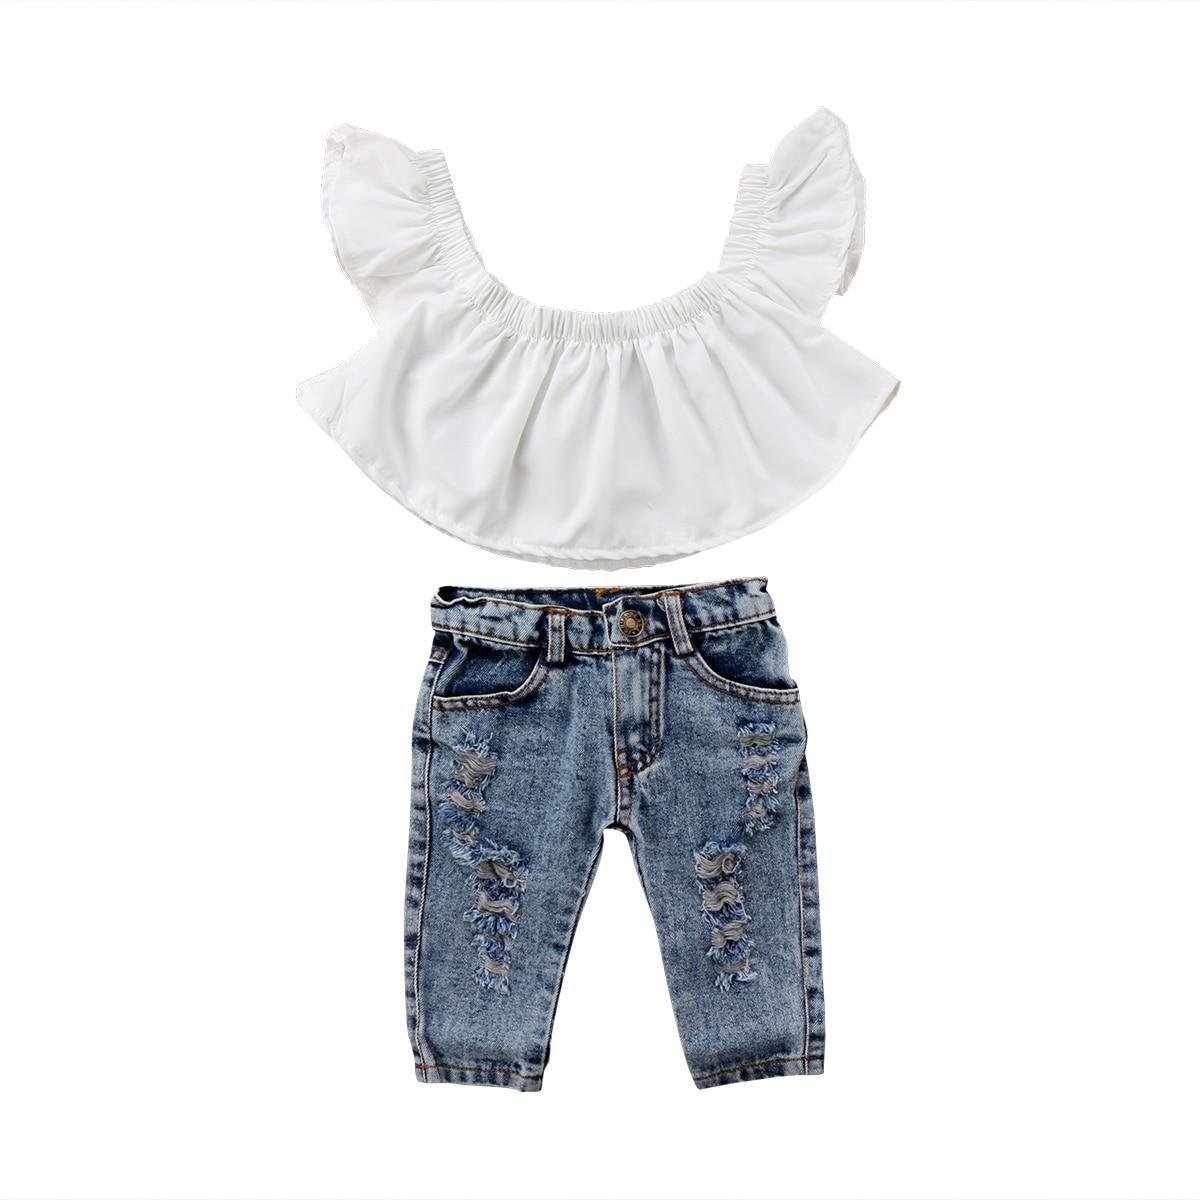 Fashion Kid Baby Set Clothes Toddler Girls Off Shoulder Tops+Denim Holes Pants 2Pcs Outfit Clothes 6M-4Y